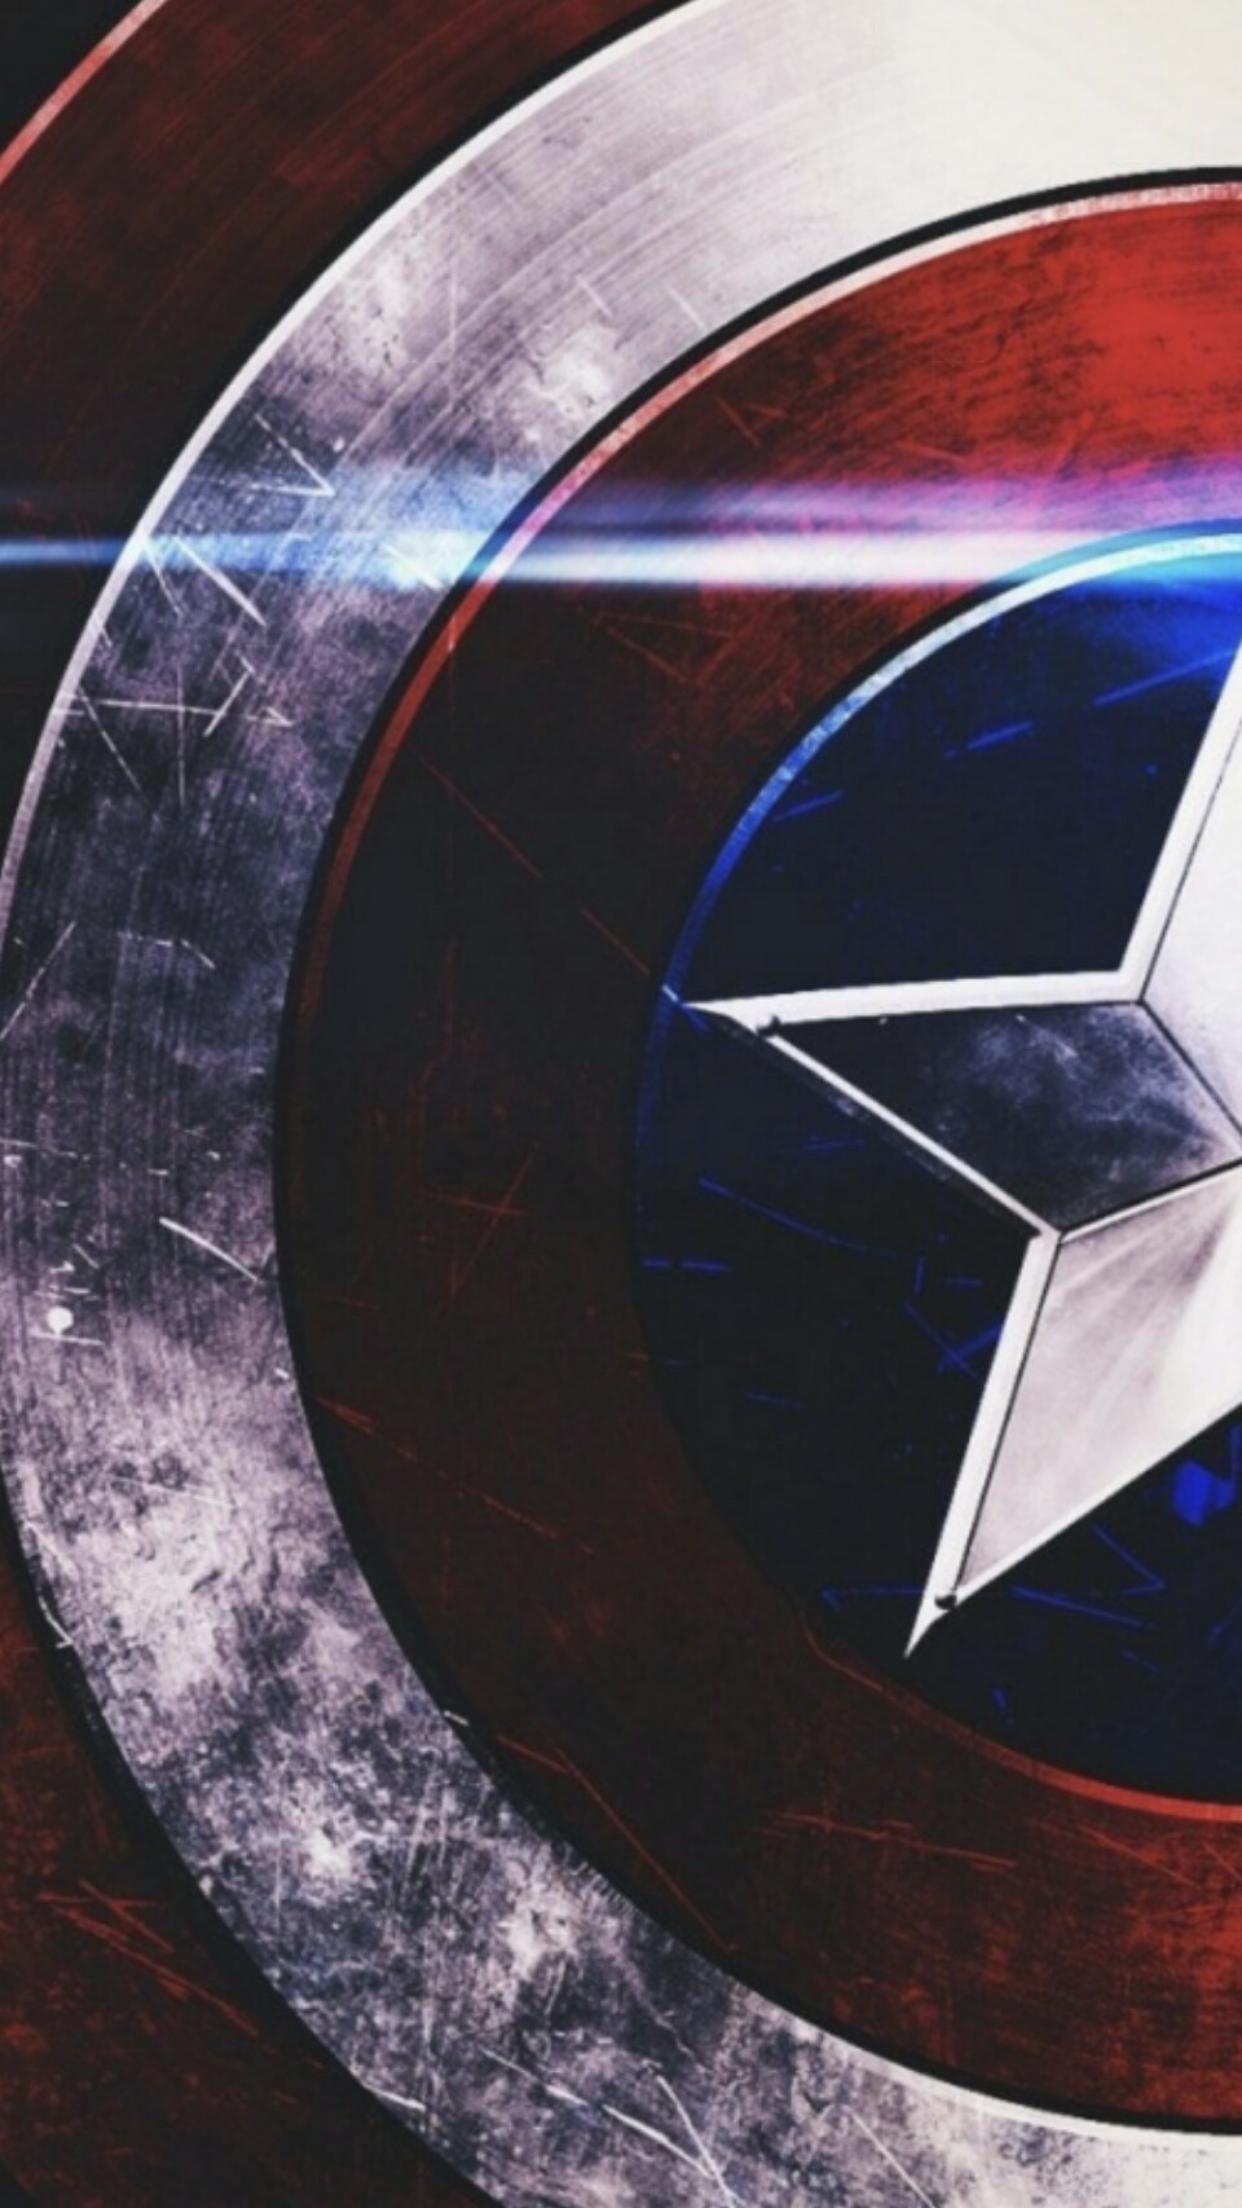 Pin by dez on ★ WALLPAPERS ★ | Bmw logo, Art, Vehicle logos